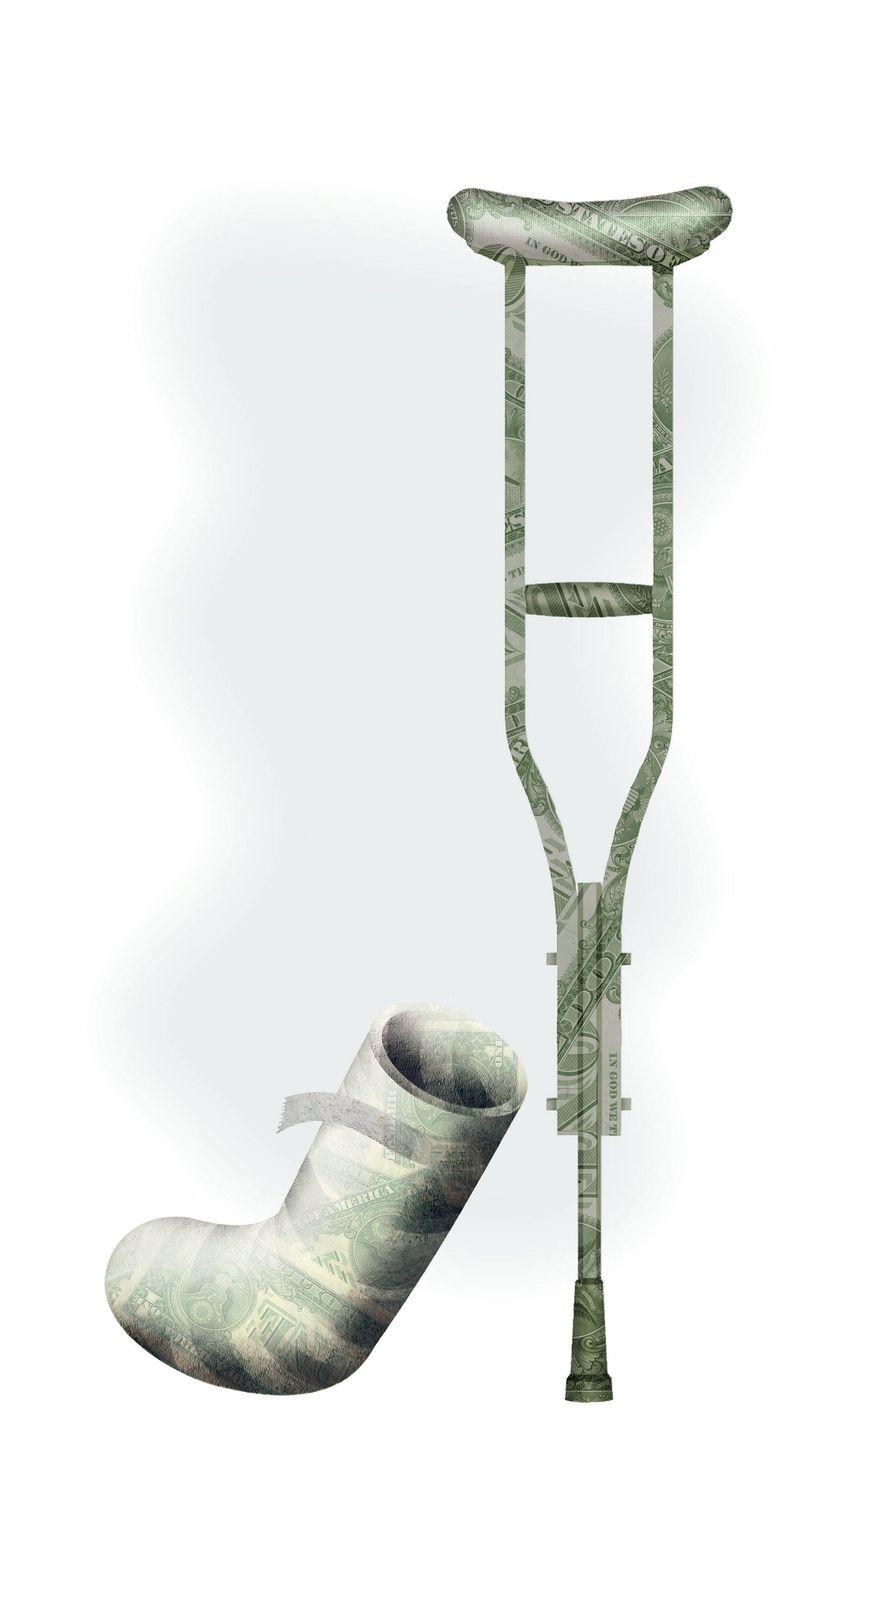 Illustration by ALexander Hunter /The Washington Times